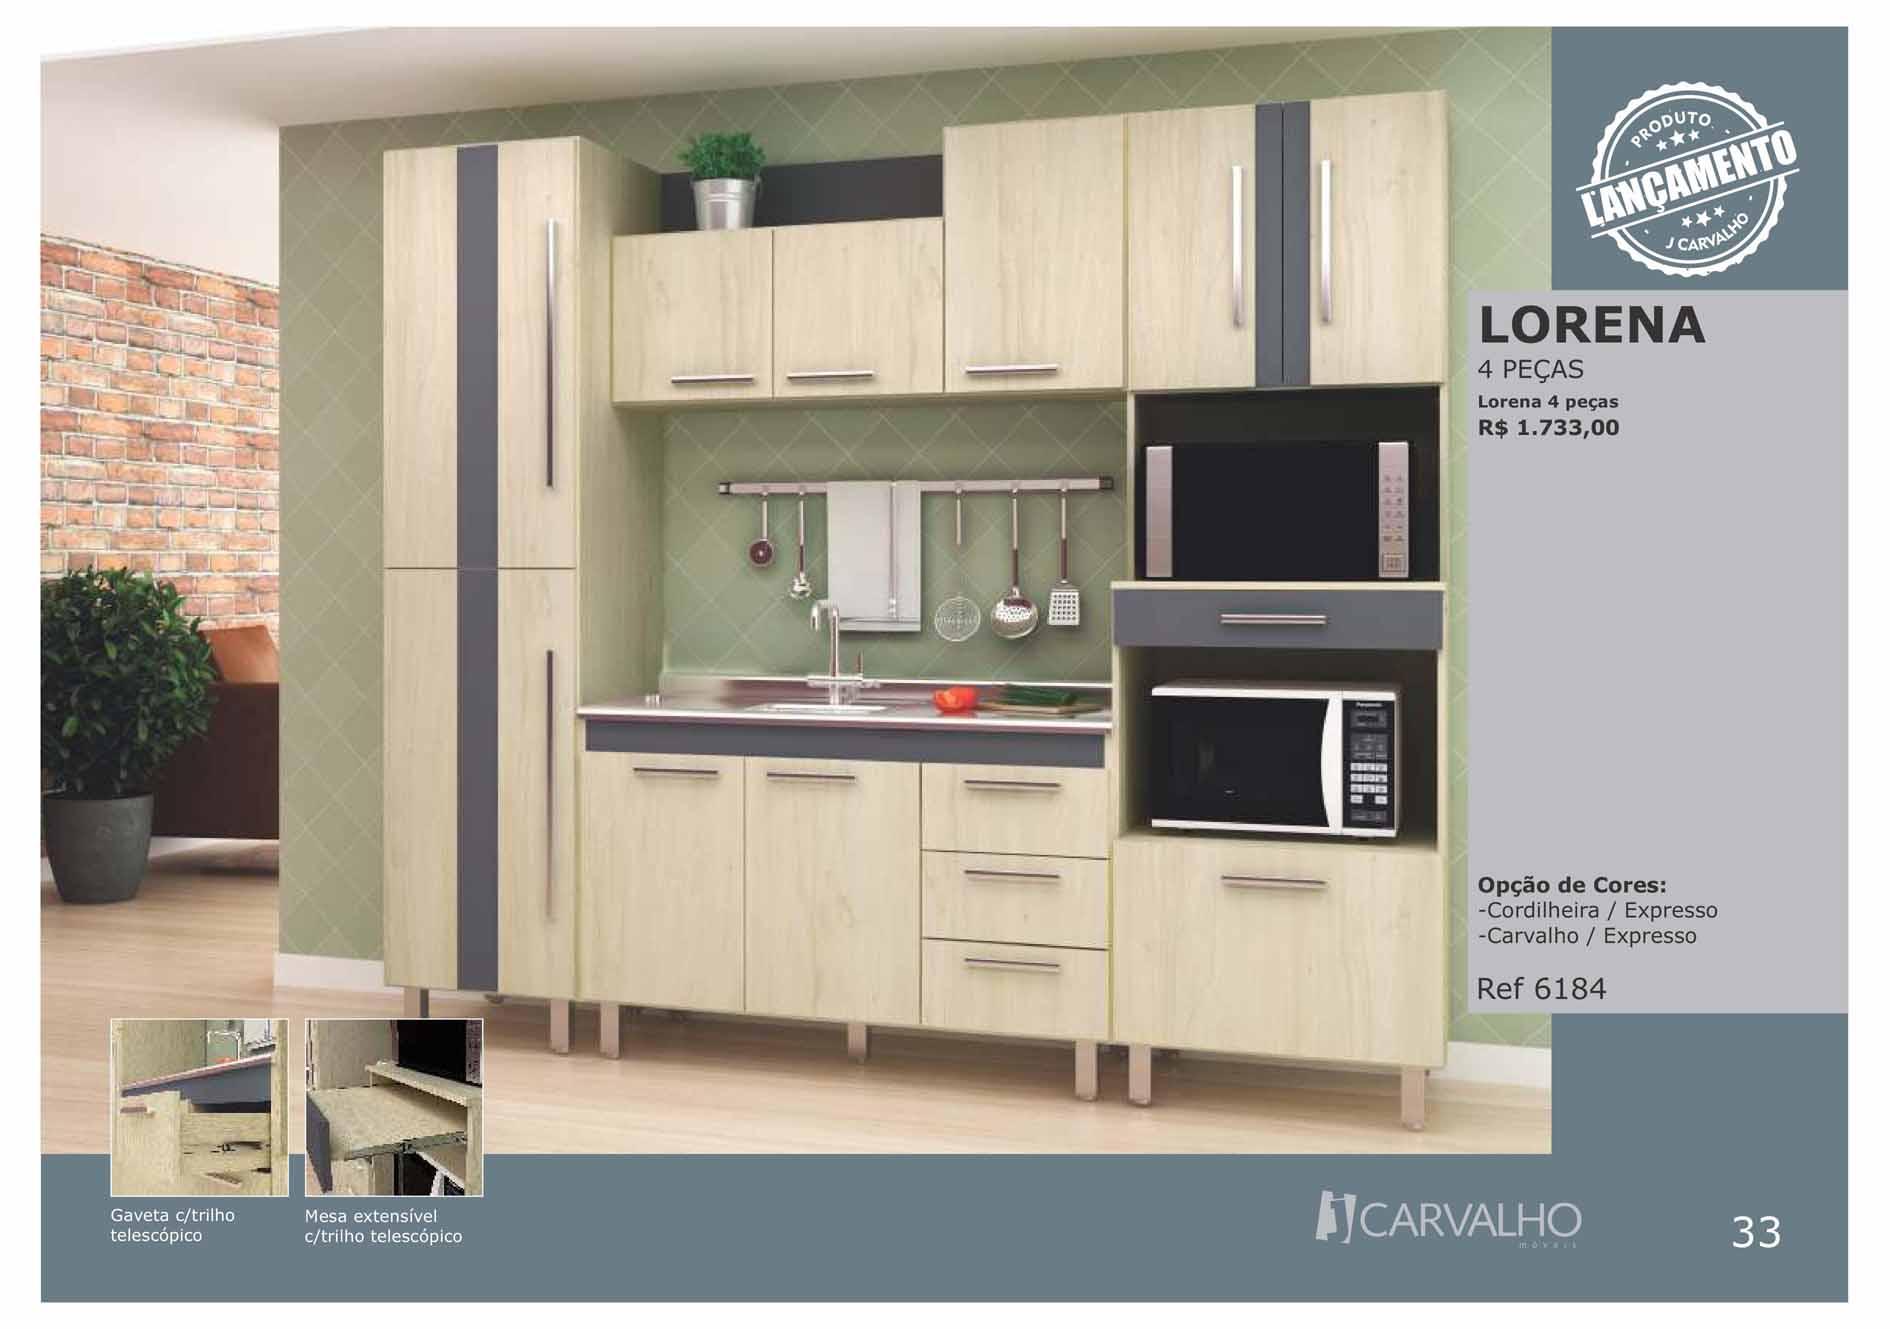 Lorena – Ref 6184